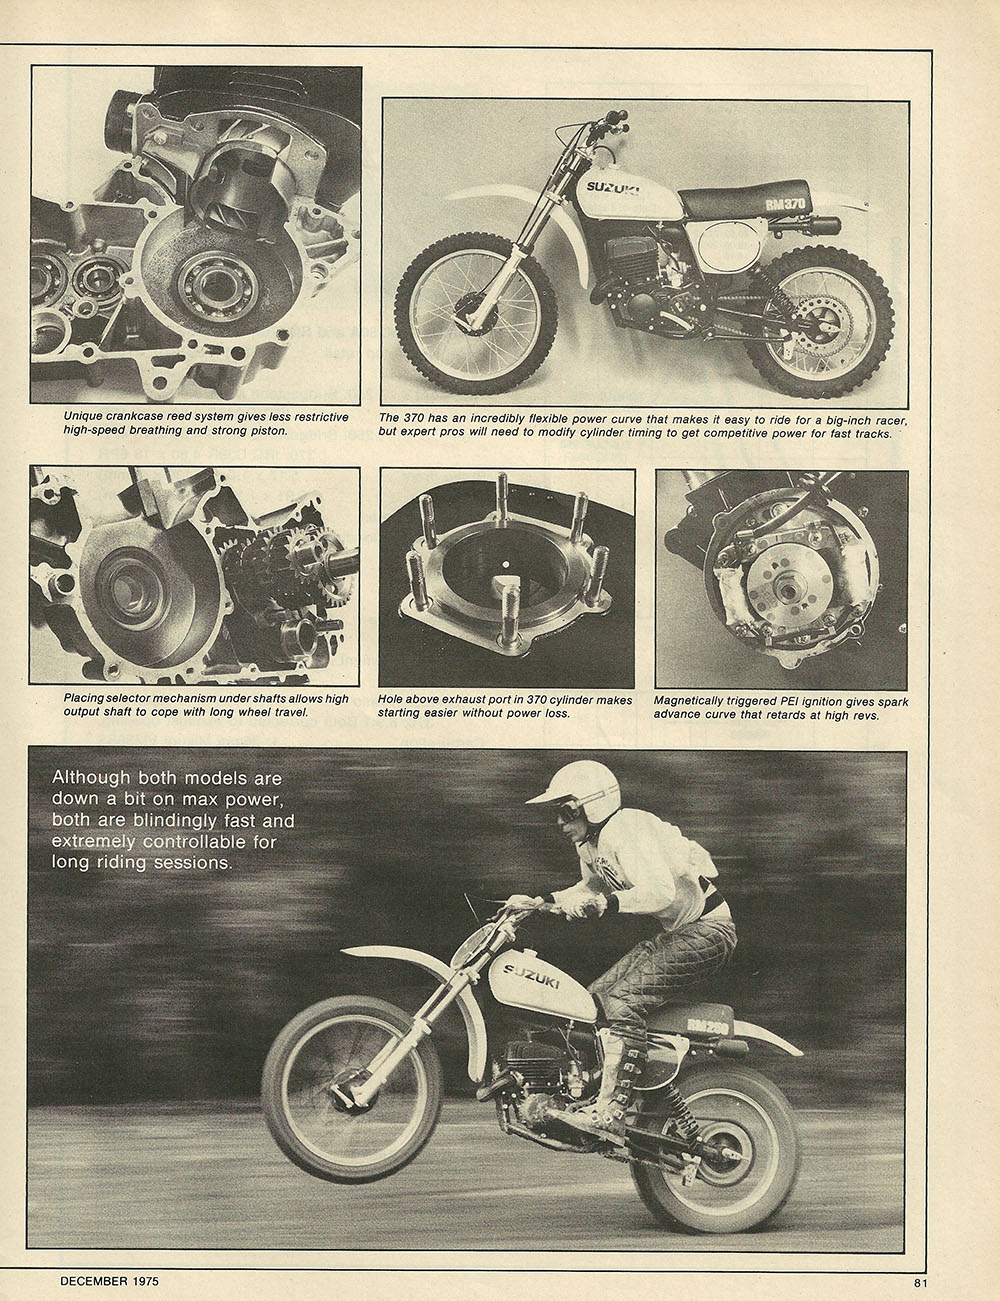 1975 Suzuki RM250 and RM370 off road test 5.JPG